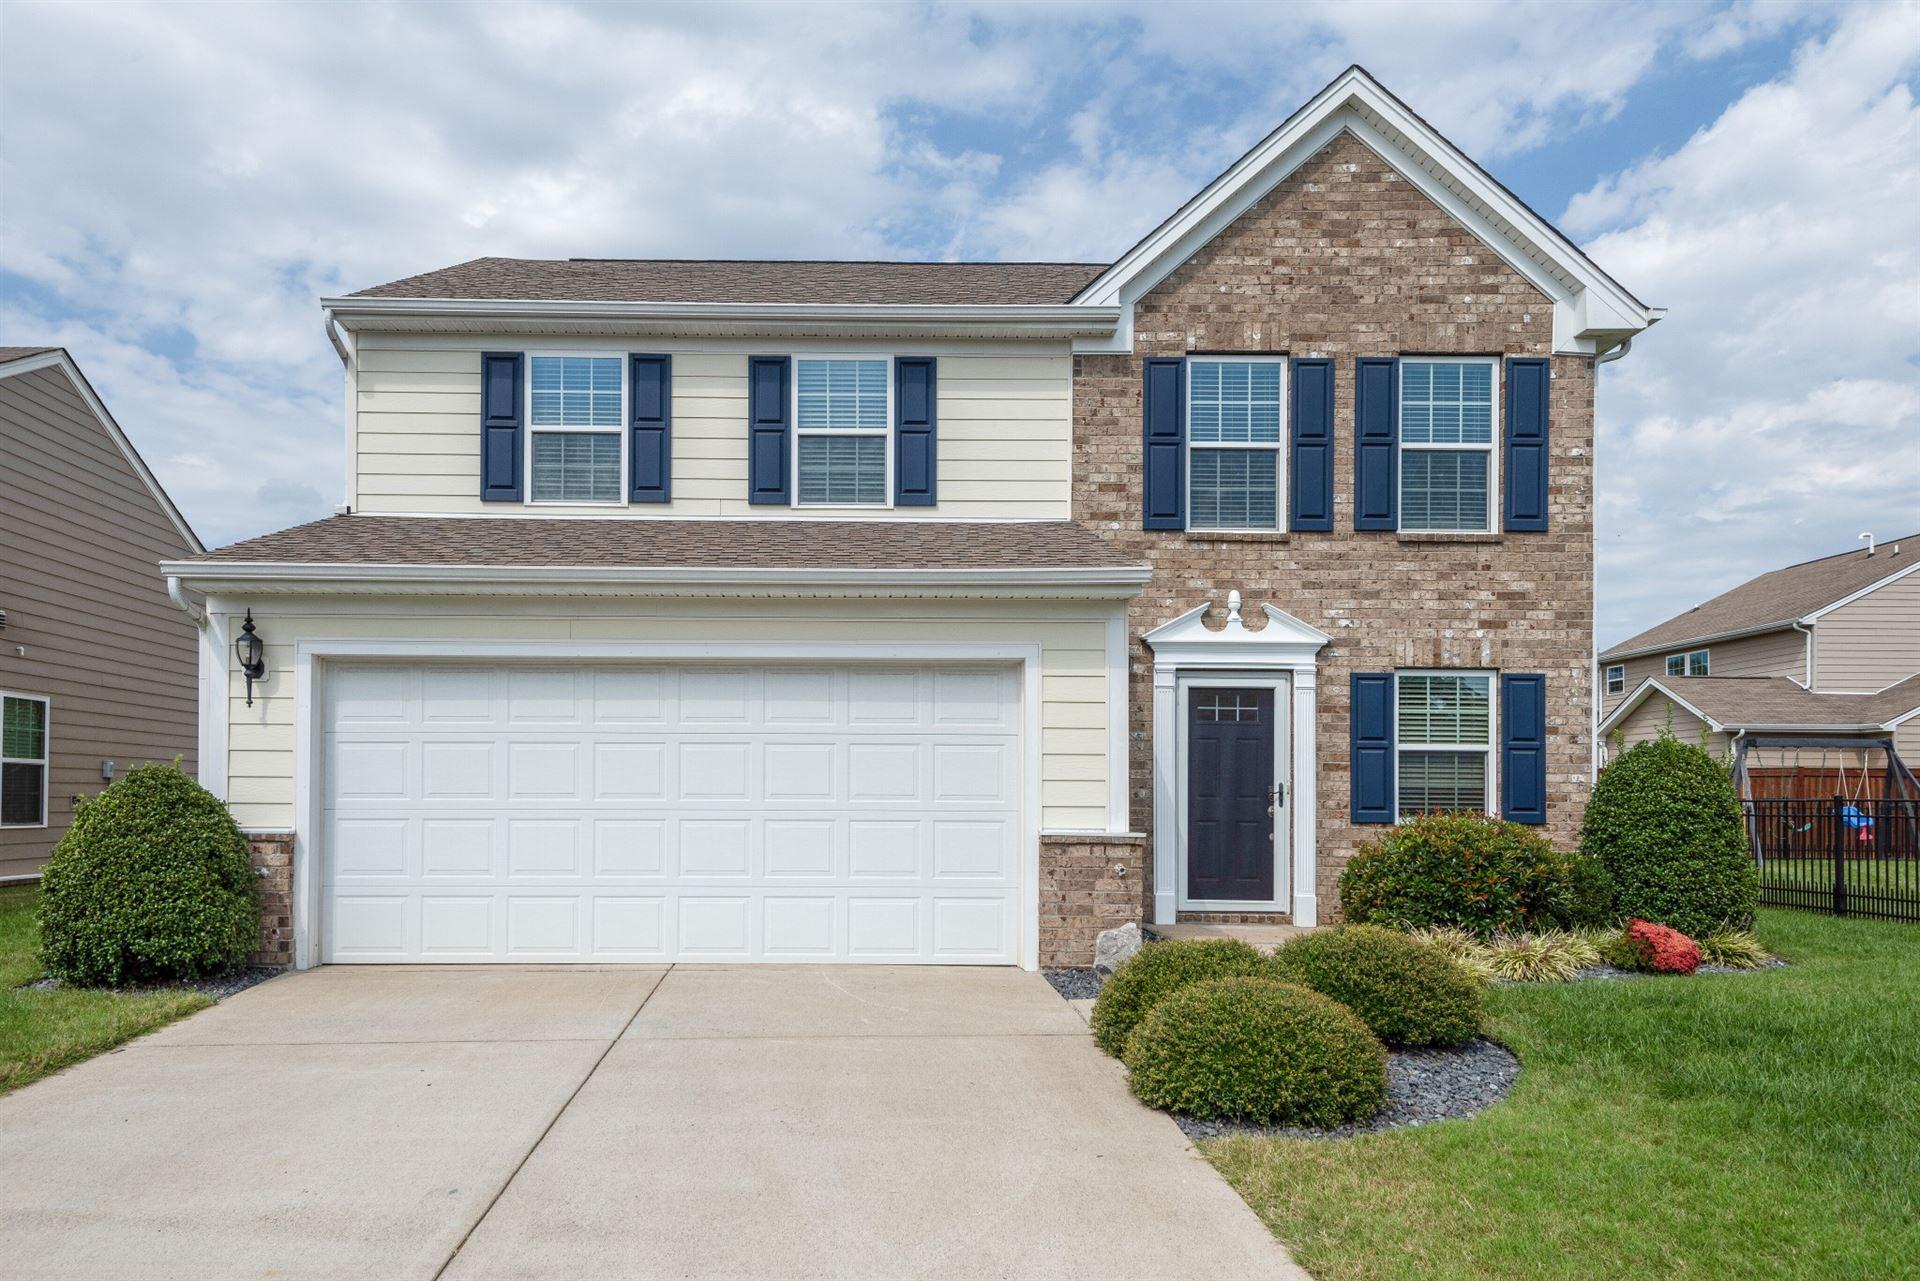 3124 Blakely Dr, Murfreesboro, TN 37128 - MLS#: 2294531